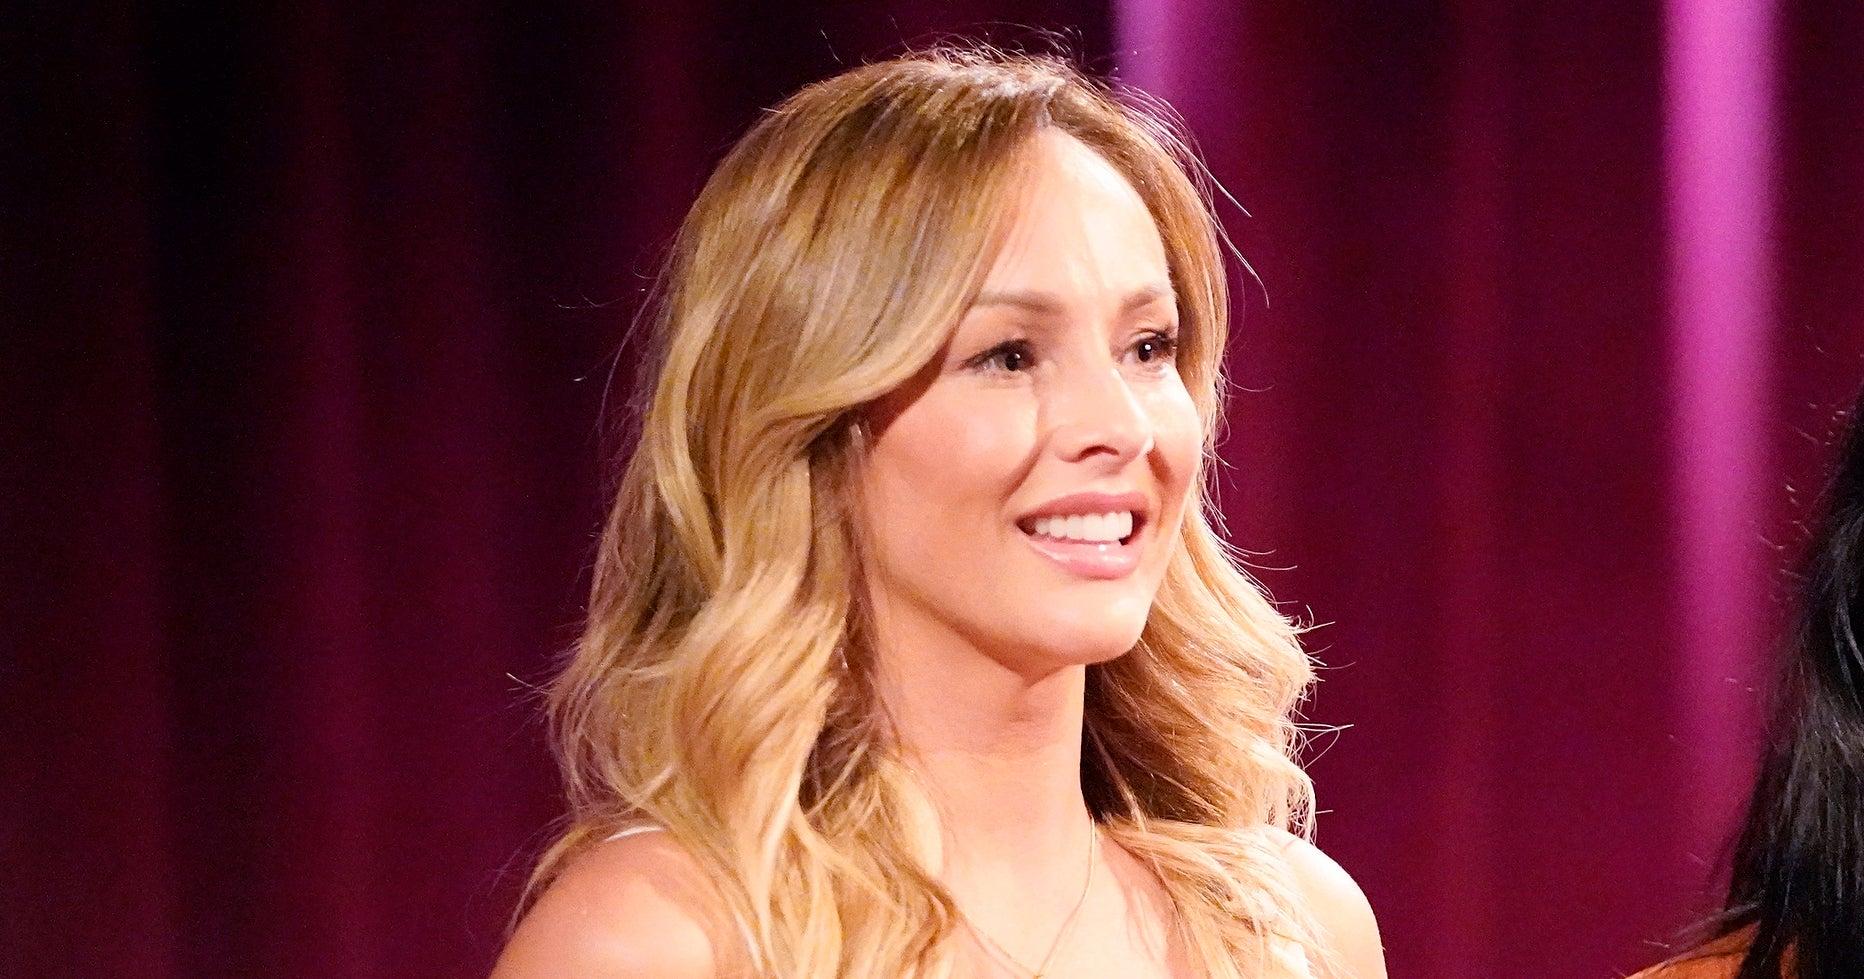 Clare Not To Blame For Bachelorette Season Controversy